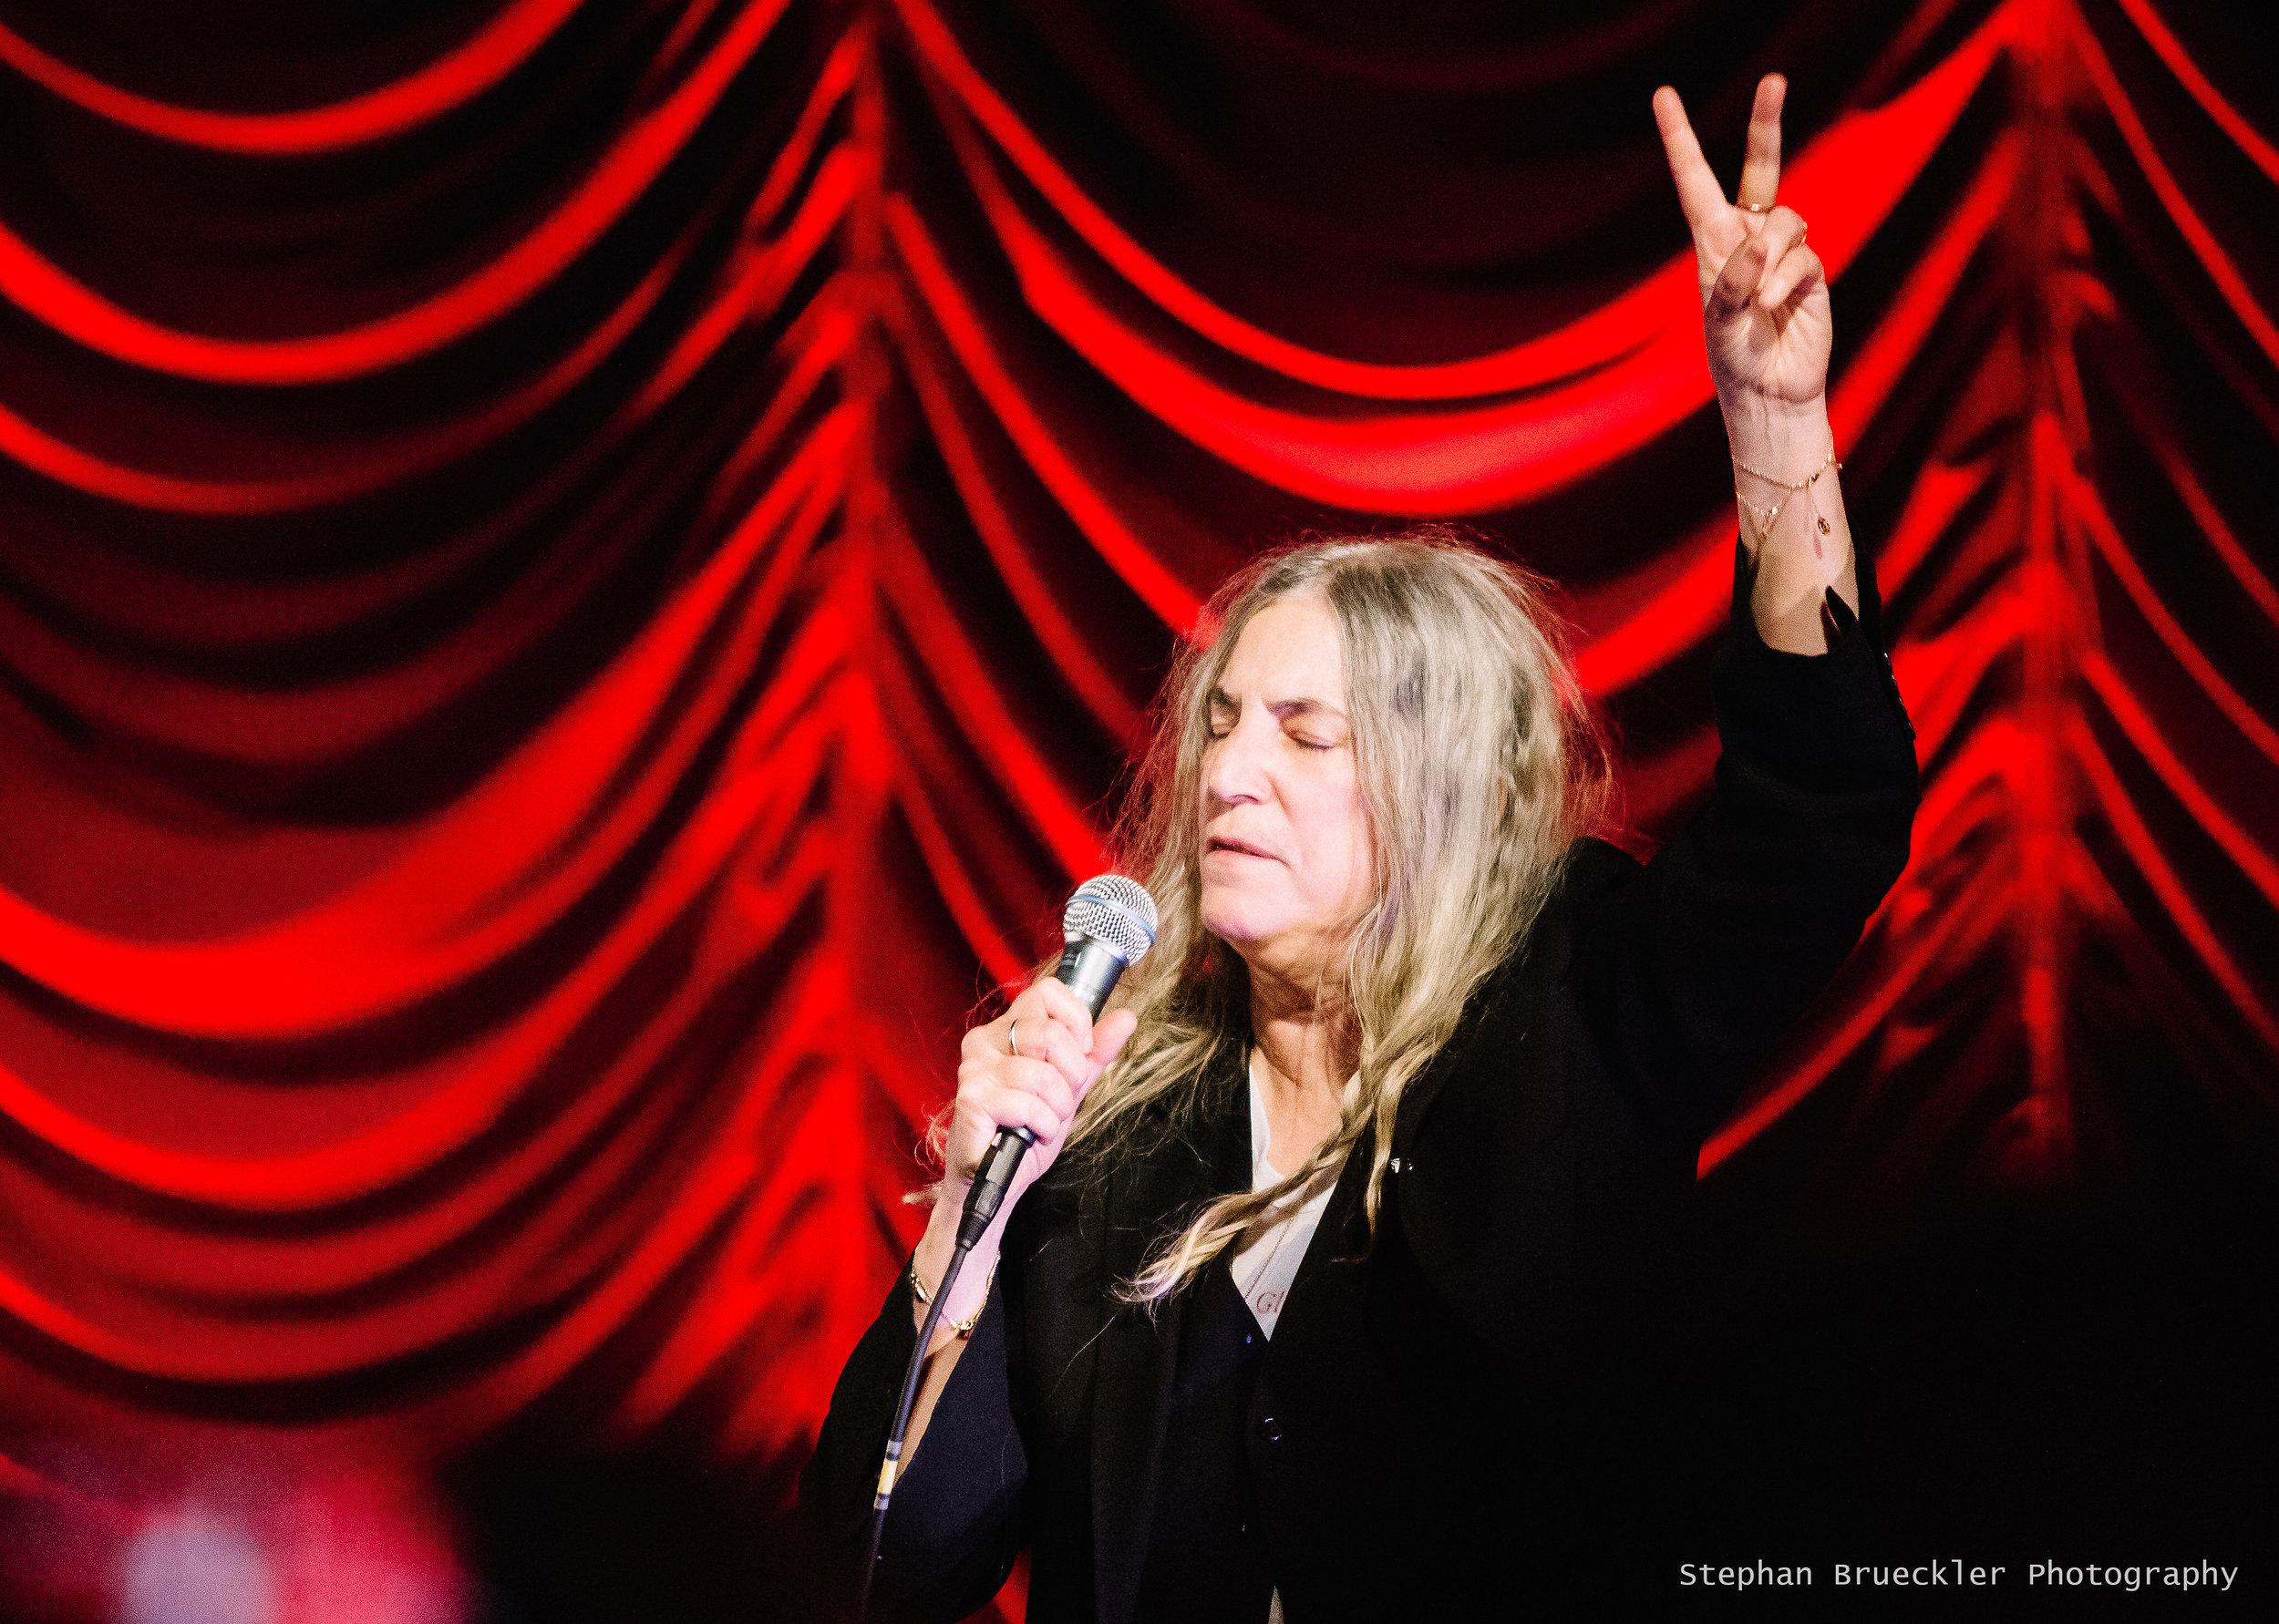 PATTI SMITH live at Filmfestival Viennale, Vienna, all saints day 2016